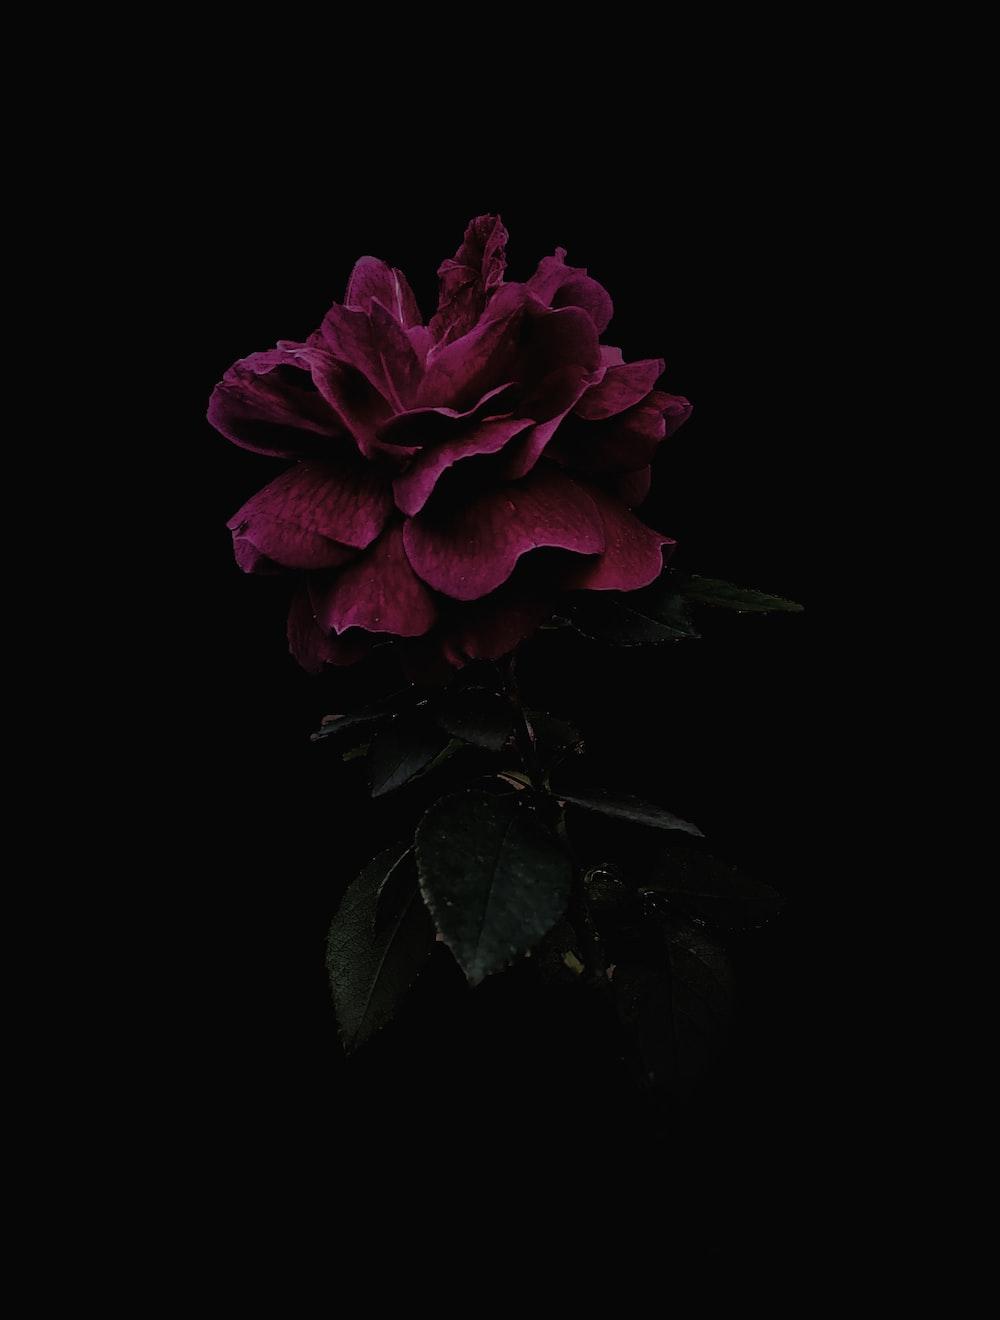 Dark Flower Pictures Download Free Images On Unsplash